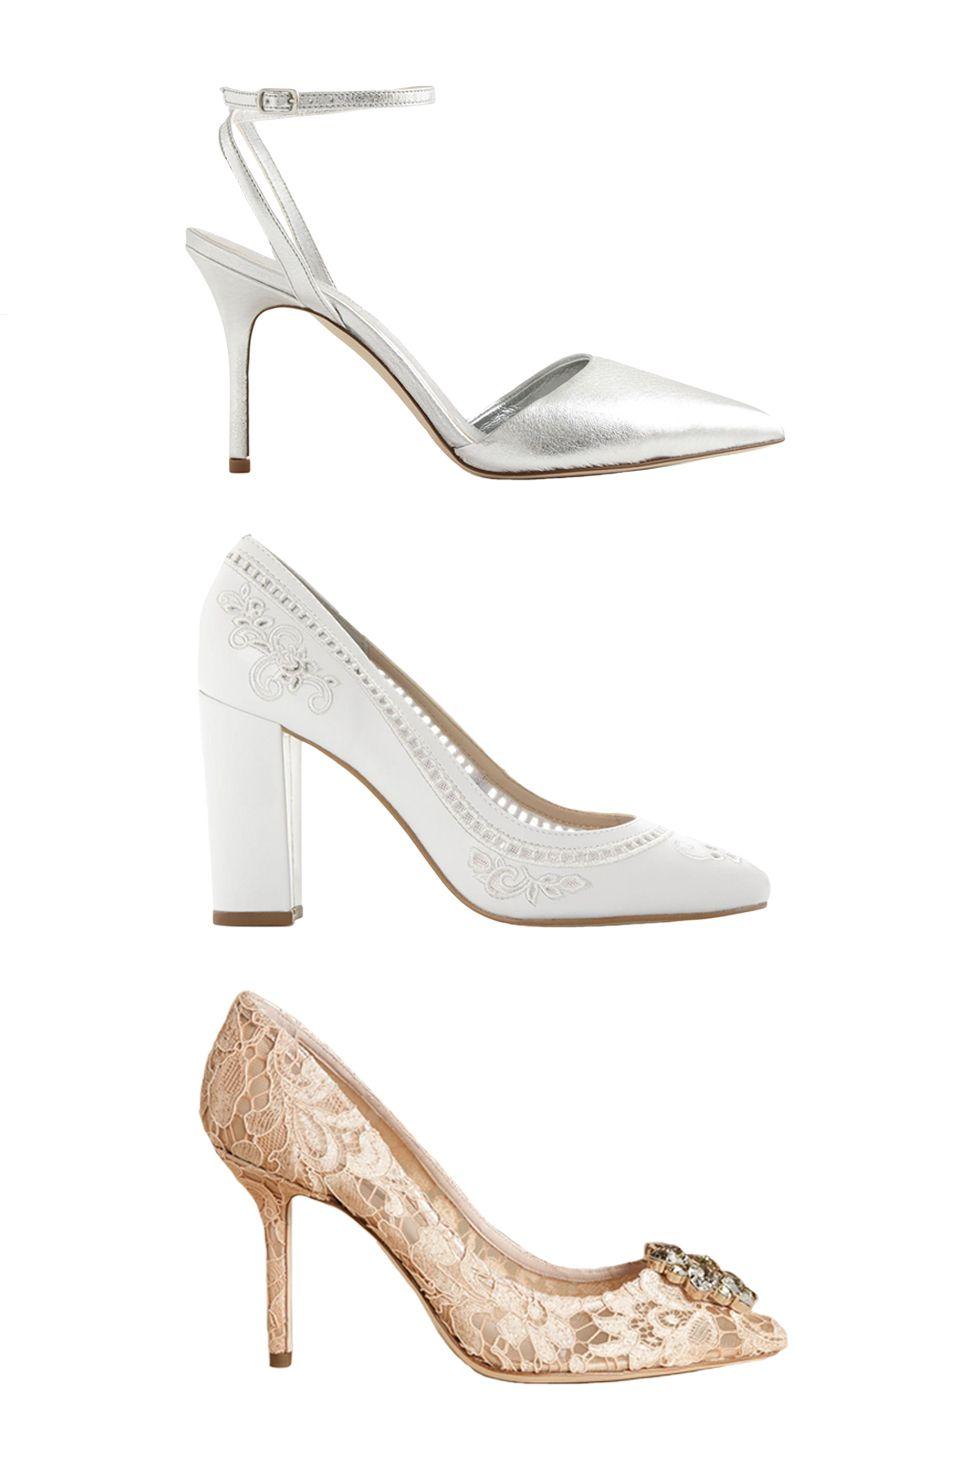 "<p>J. Crew Elsie Metallic Ankle-Wrap Pumps, $245; <a href=""https://www.jcrew.com/womens_category/shoes/pumpsandheels/PRDOVR~F1304/F1304.jsp"" target=""_blank"">jcrew.com</a></p><p><a href=""https://www.jcrew.com/womens_category/shoes/pumpsandheels/PRDOVR~F1304/F1304.jsp"" target=""_blank""></a>Dune London Bethanee, $140; <a href=""http://www.dunelondon.com/en-us/bethanee-embroidered-court-shoe-0084504510001487/"" target=""_blank"">dunelondon.com</a></p><p>Dolce & Gabbana Pumps, $995; <a href=""http://store.dolcegabbana.com/us/dolce-gabbana/closed-toe-slip-ons_cod11002082pf.html"" target=""_blank"">dolceandgabbana.com</a></p>"